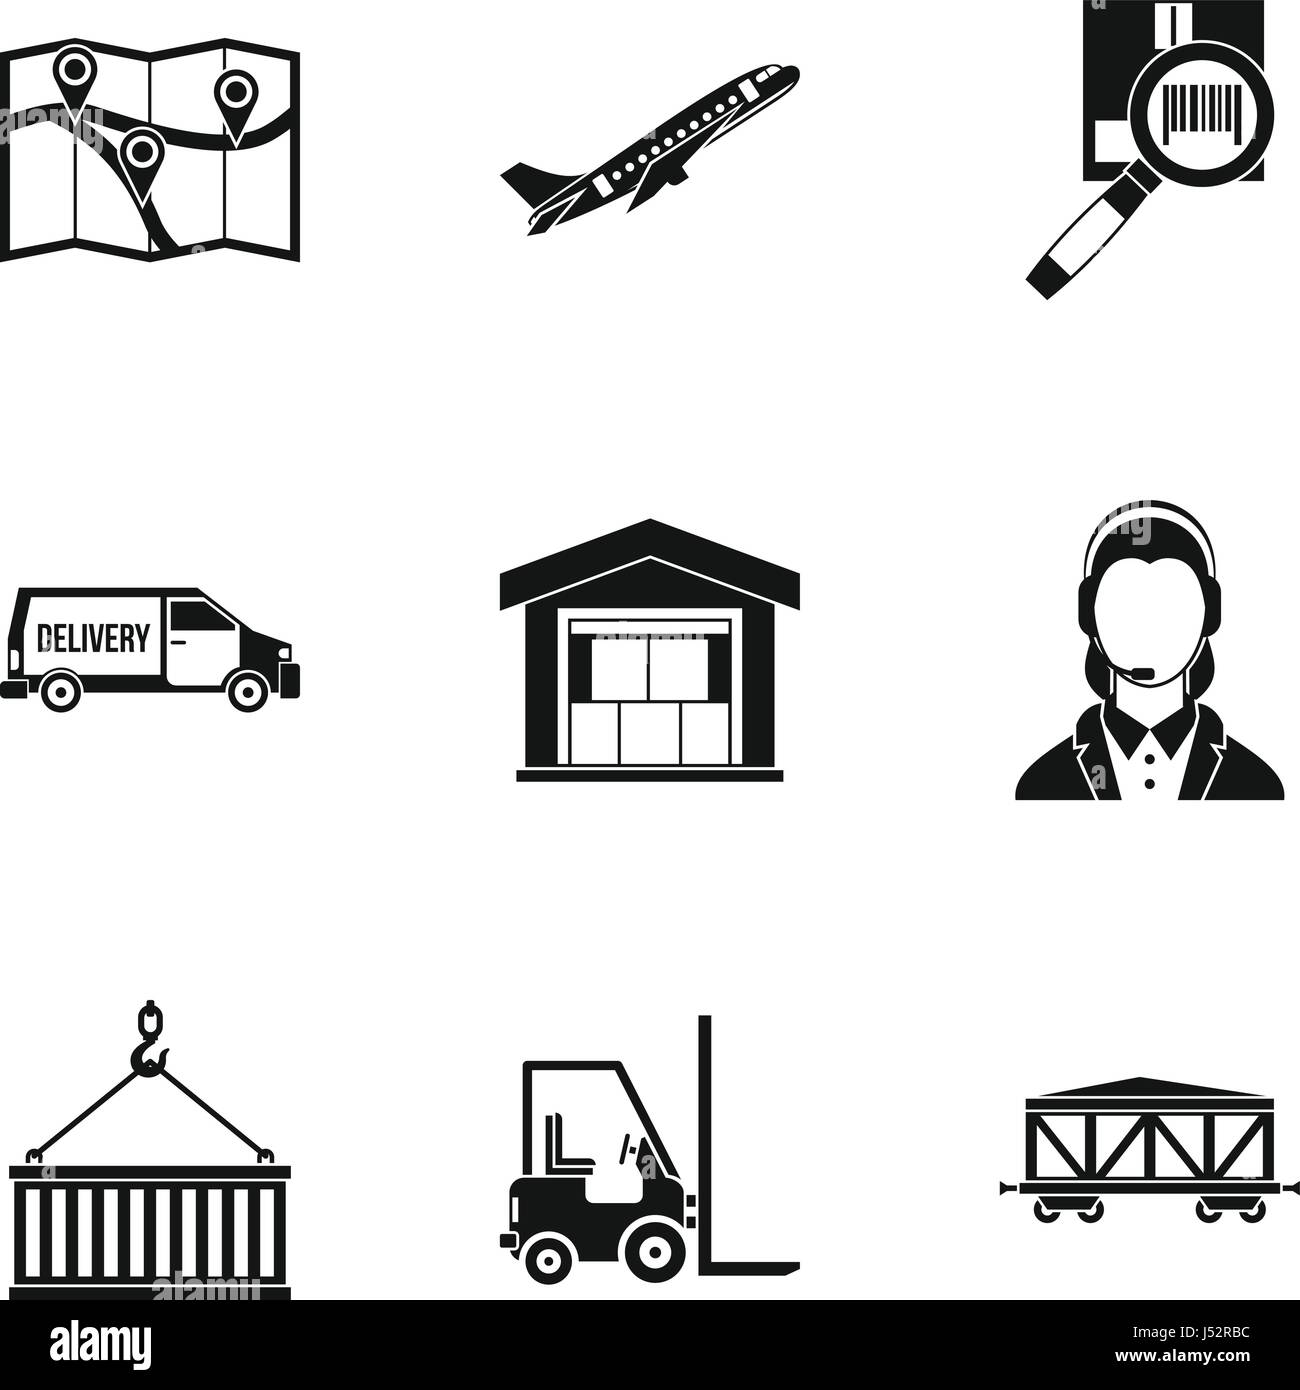 Barcode Scanner Car Stock Photos & Barcode Scanner Car Stock